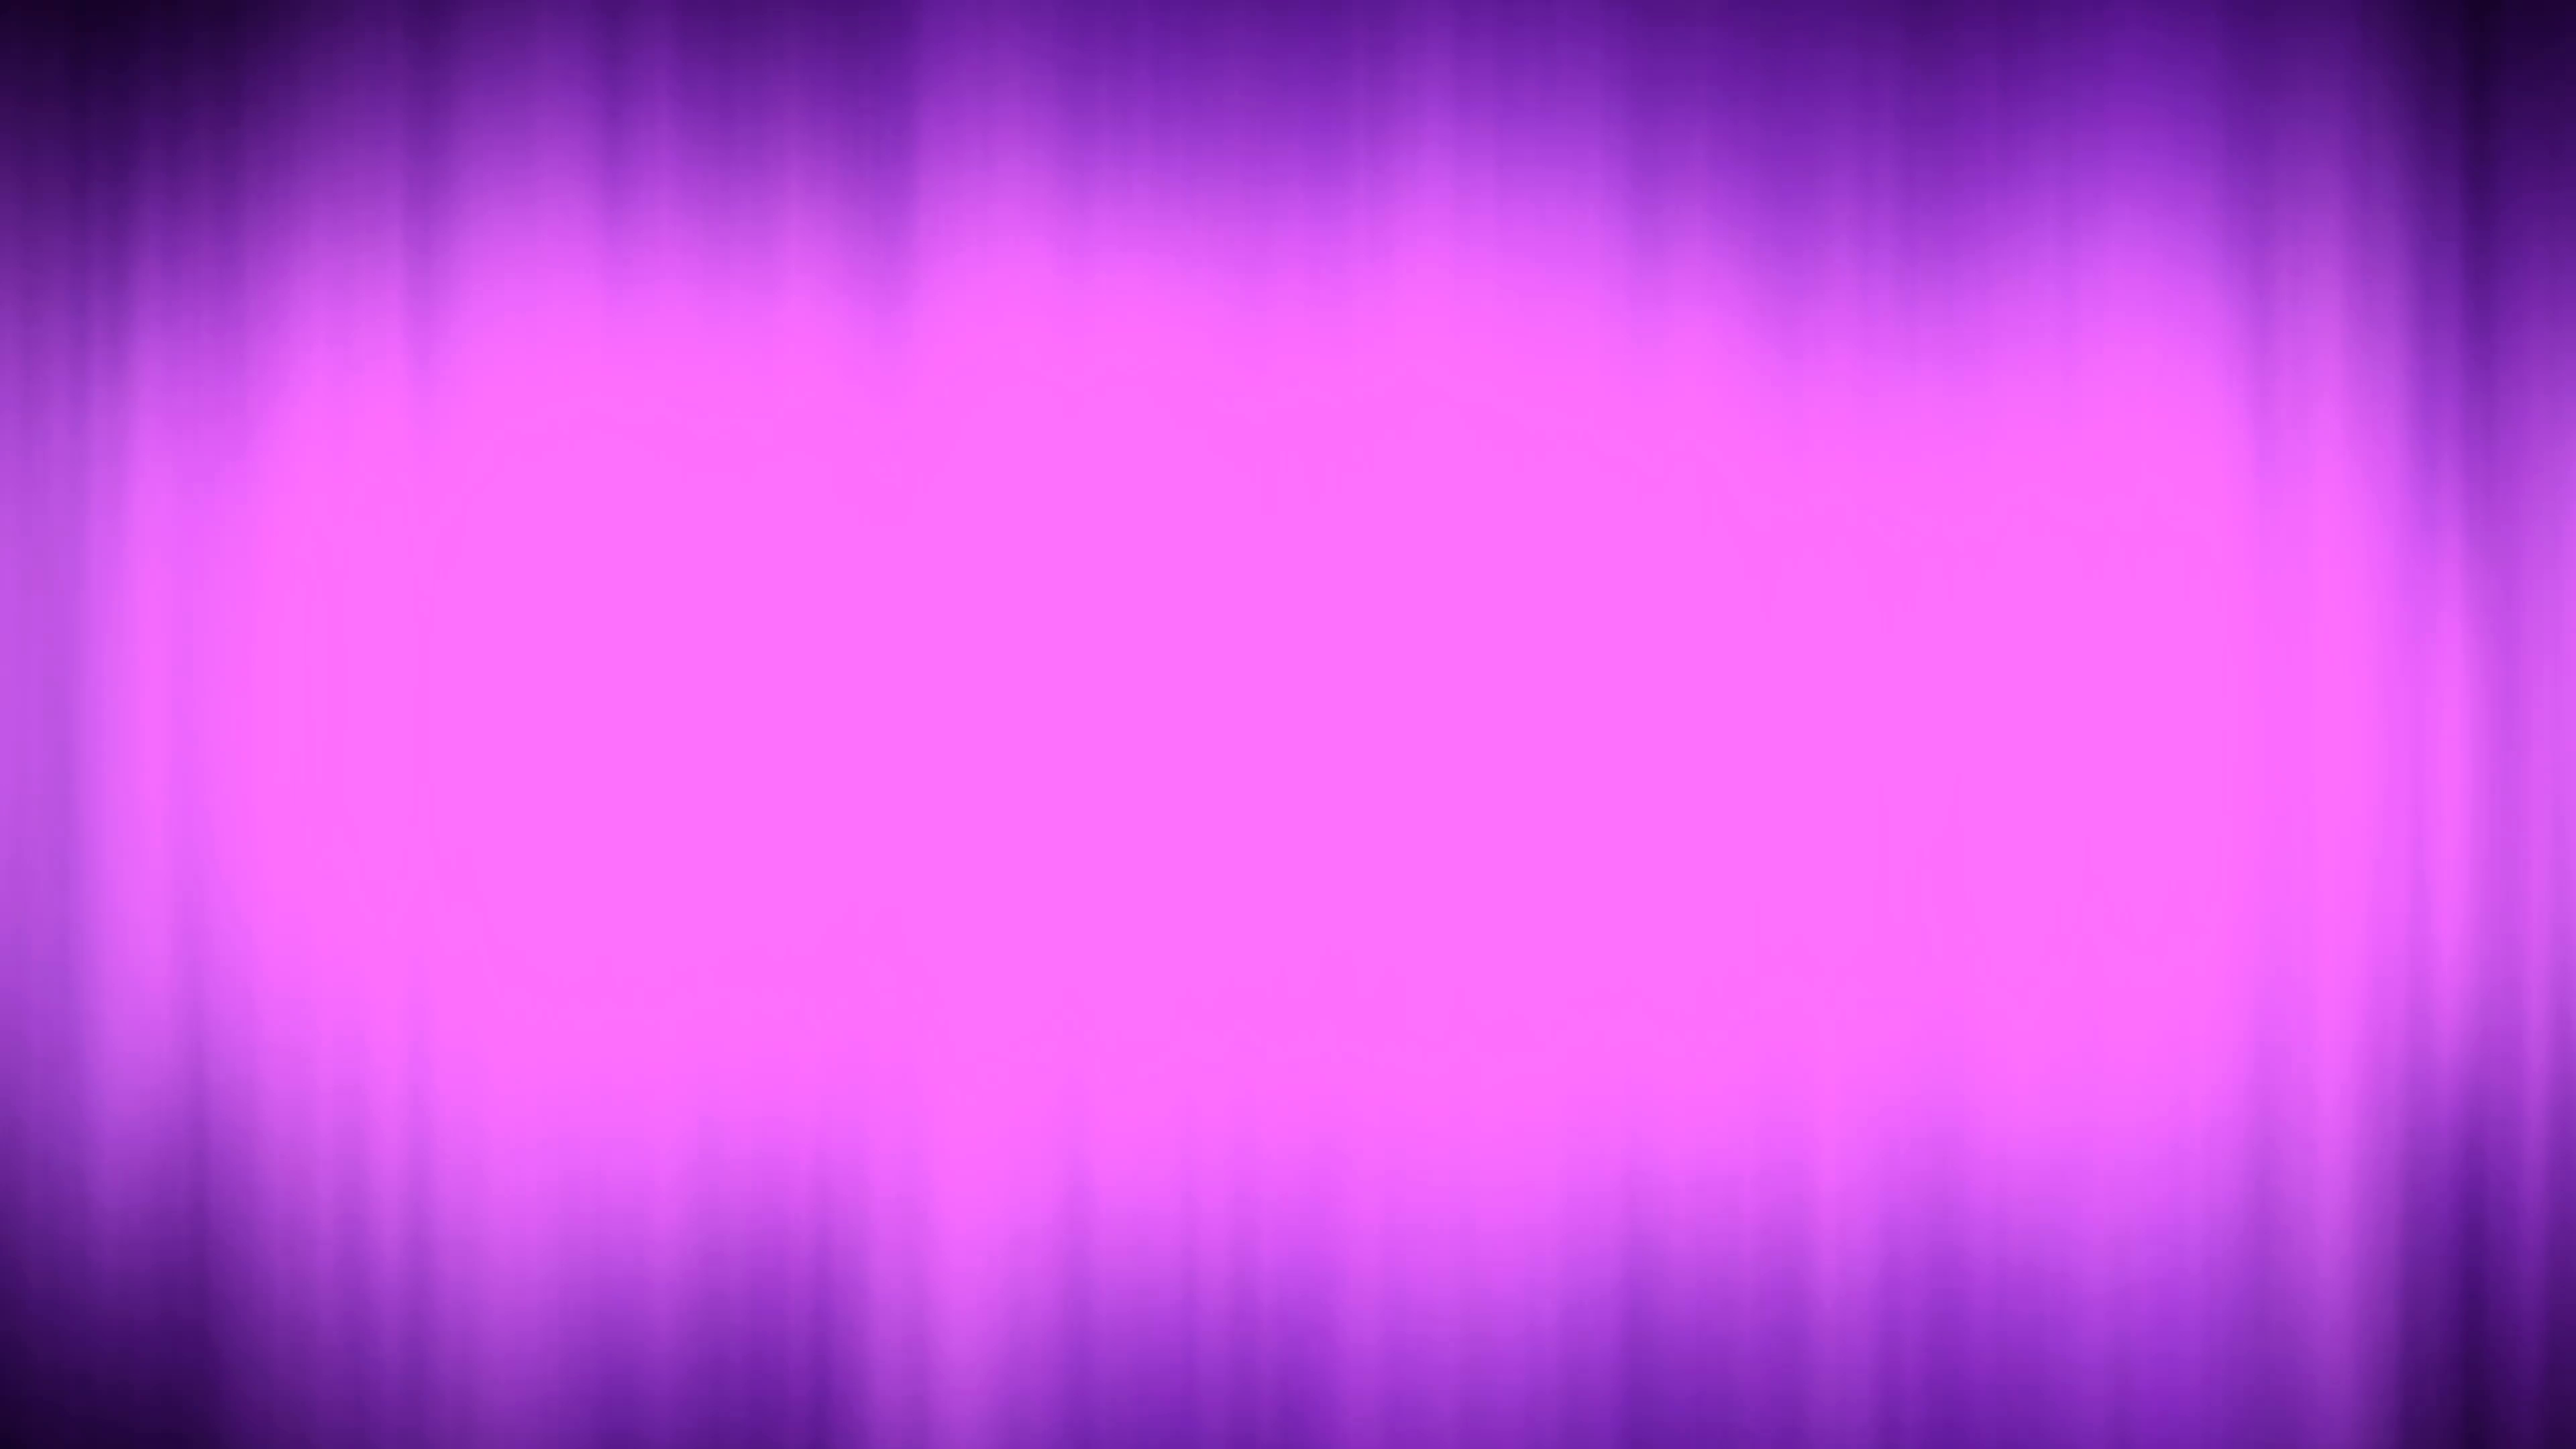 After Effects Lyric Video Template Luxury 4k Purple Aurora Motion Background Loop Audio Waveform